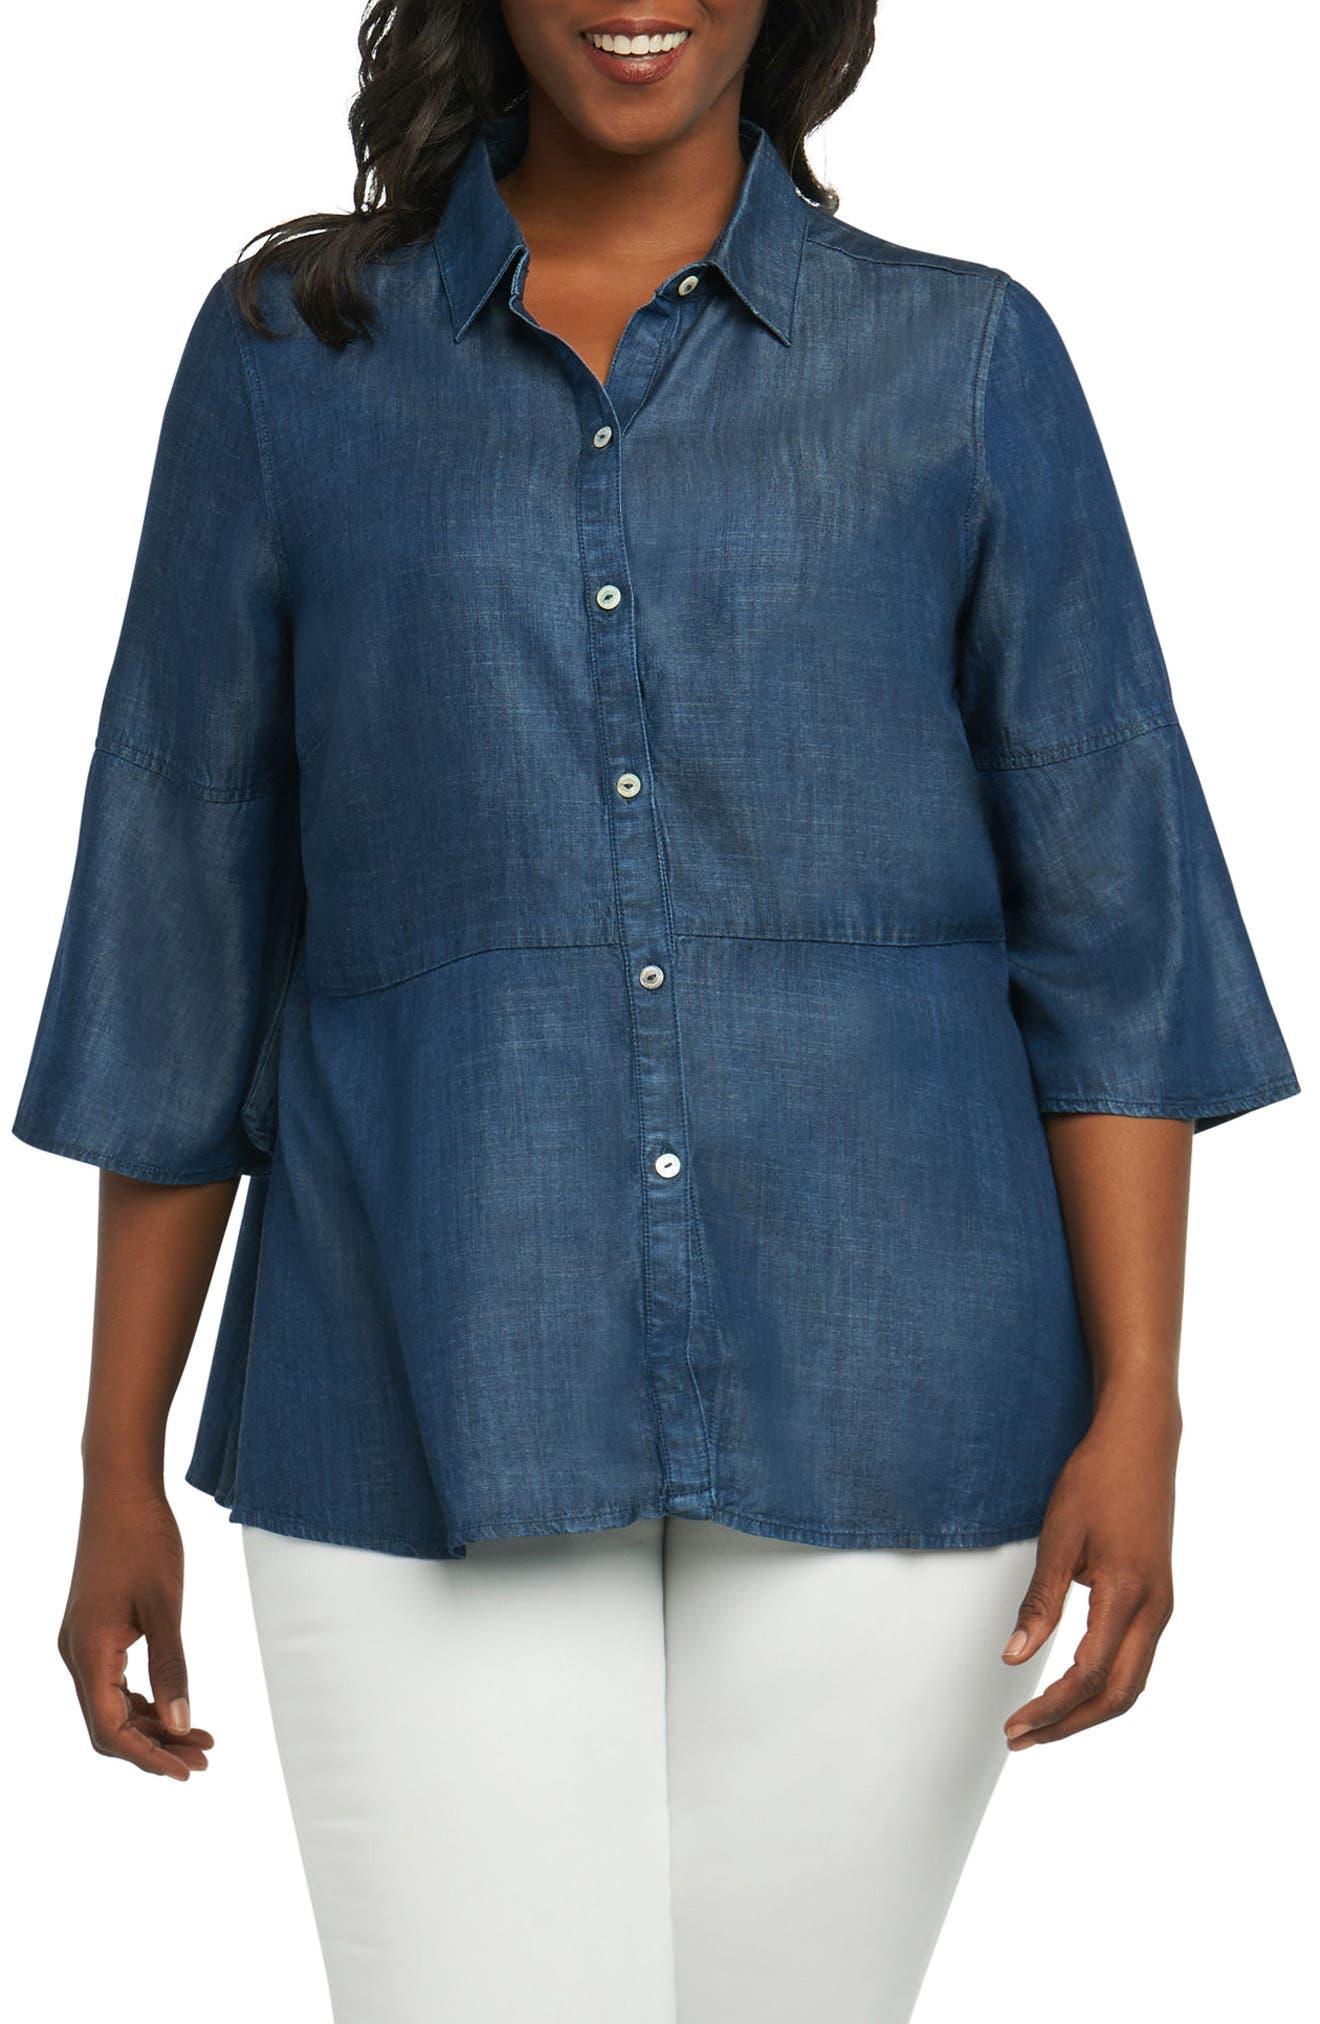 Estelle Chambray Shirt,                             Main thumbnail 1, color,                             Navy